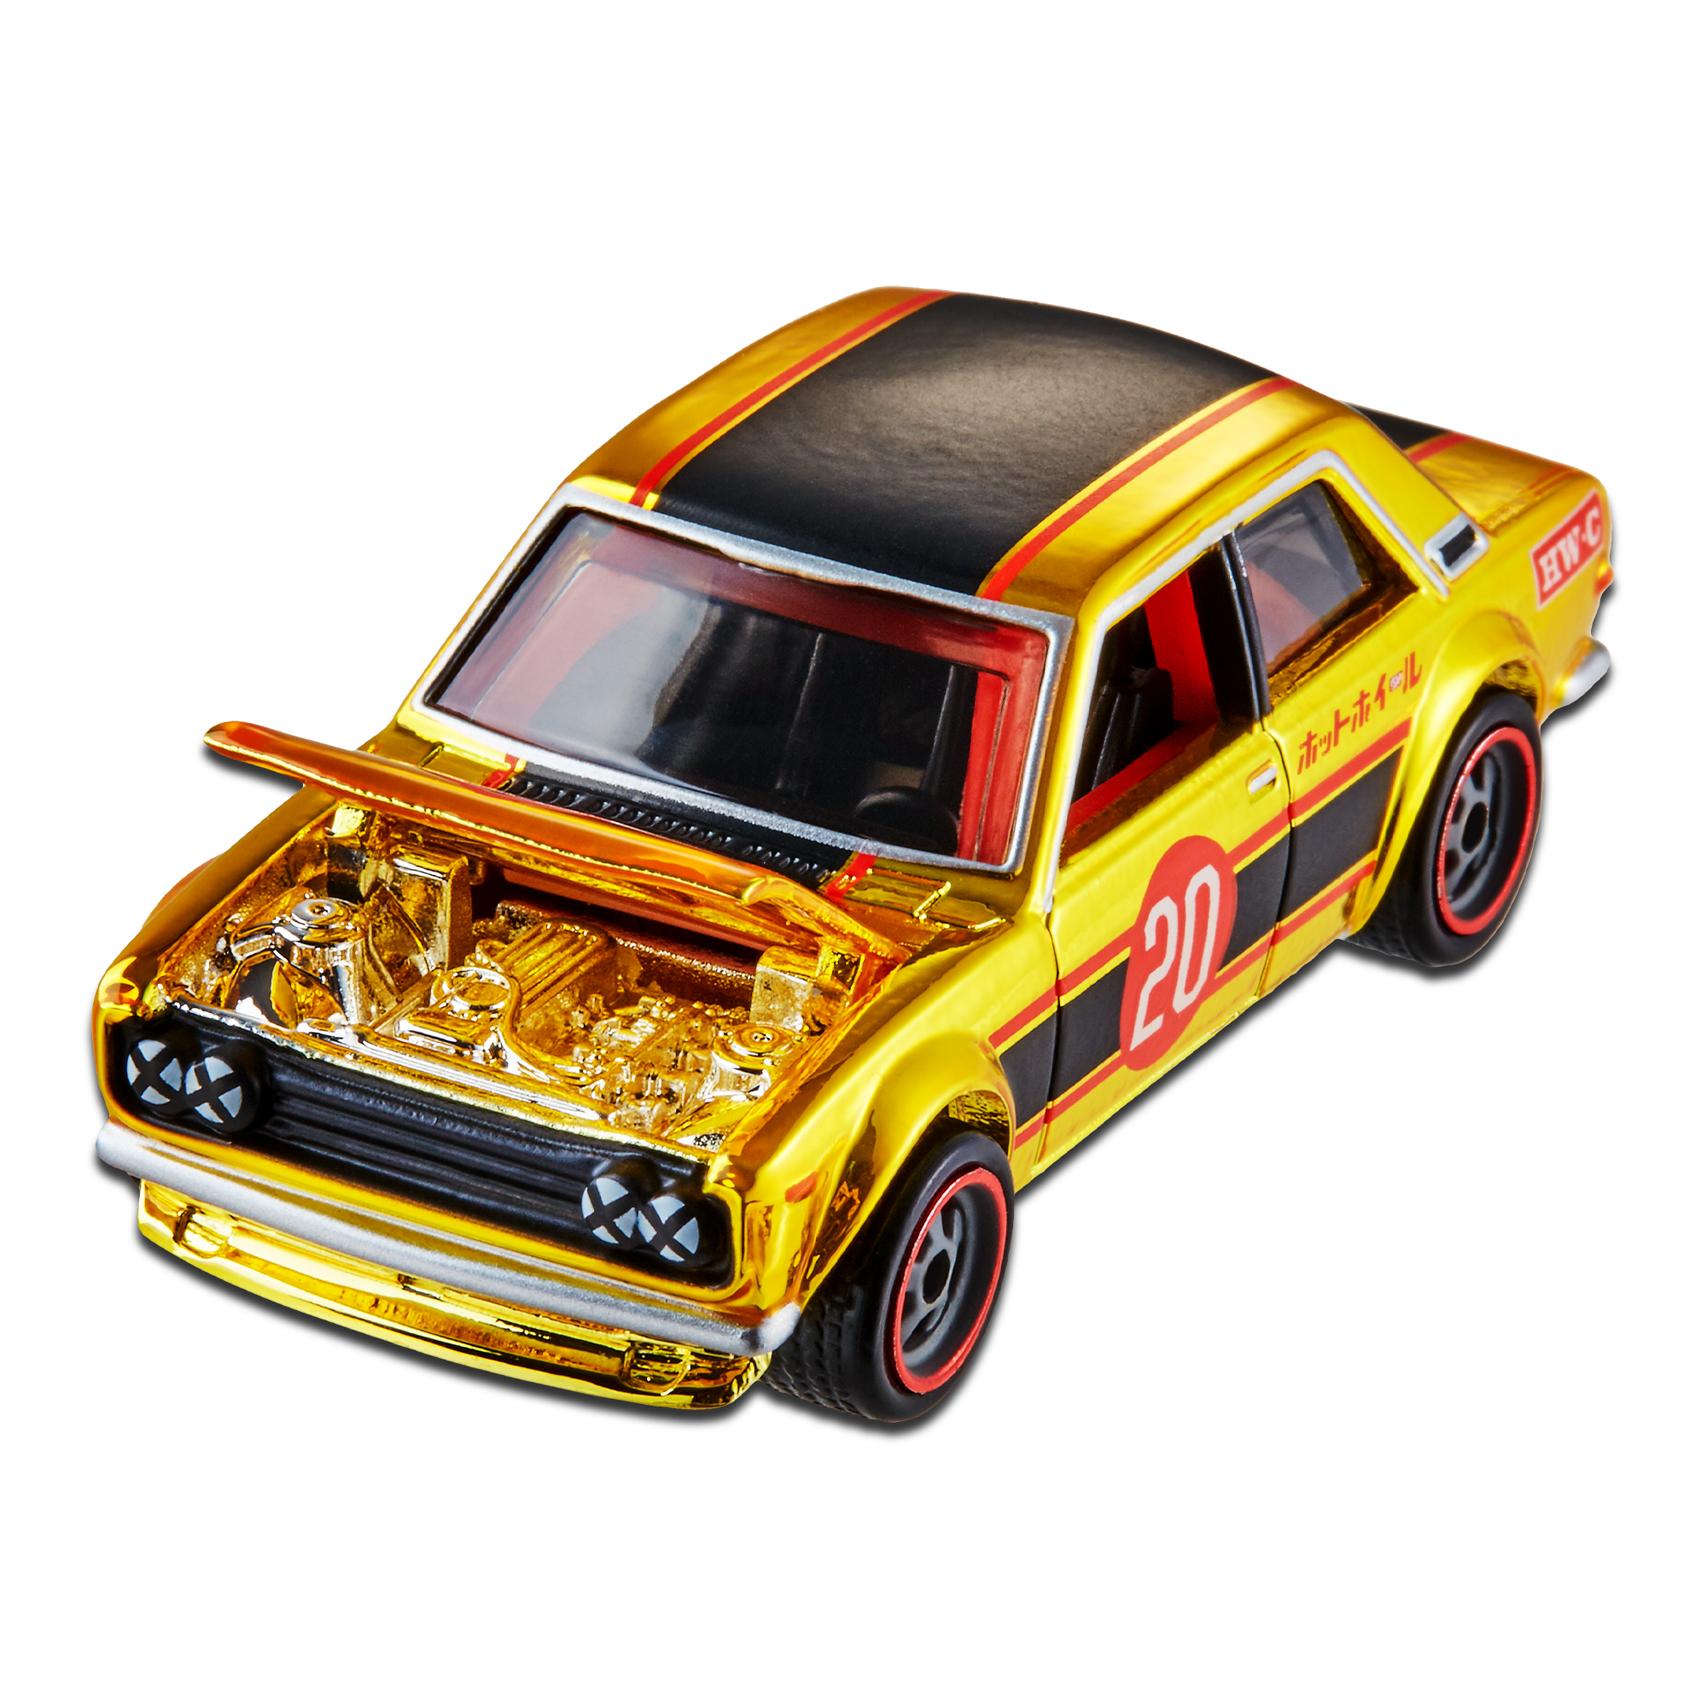 Hot Wheels cars gold